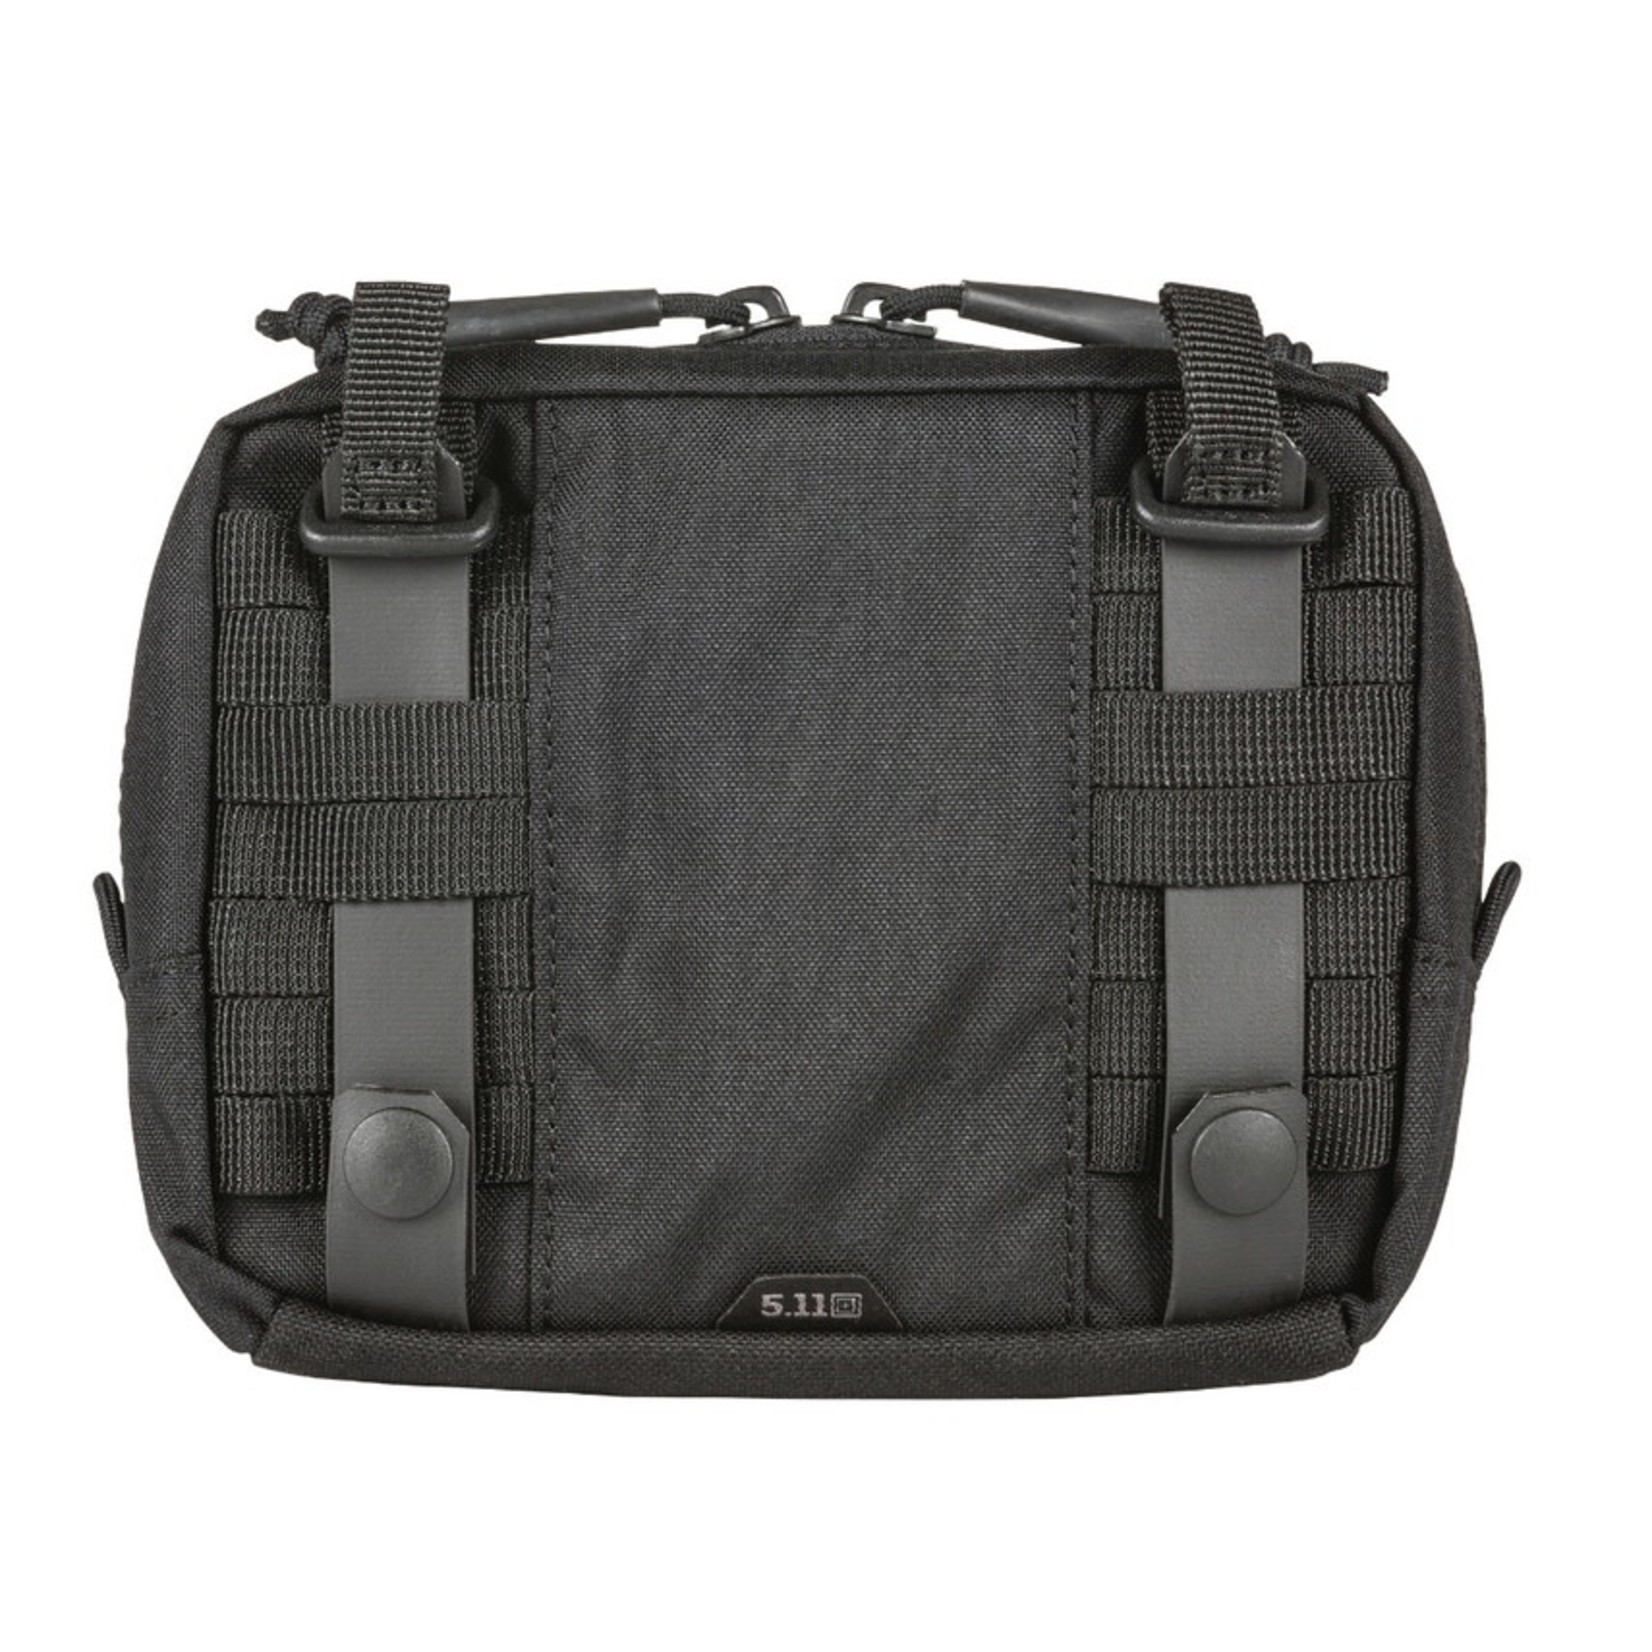 5.11 Tactical 5.11 Flex Medium GP Pouch